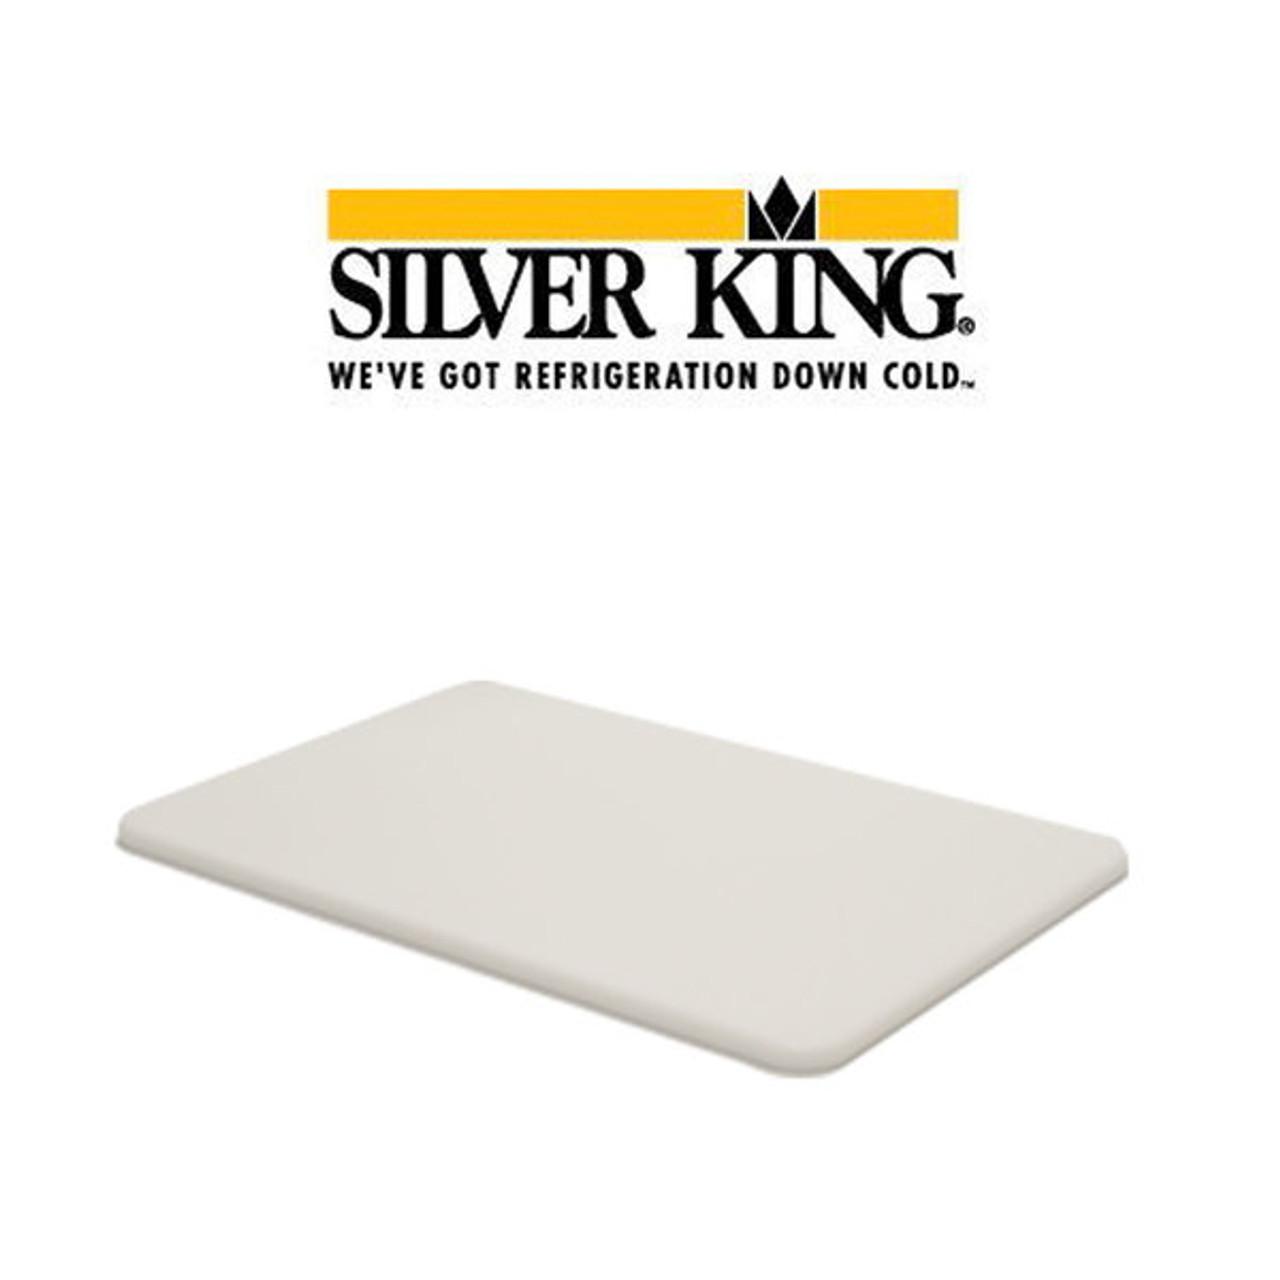 OEM Cutting Board - Silver King - P#: 10330-12